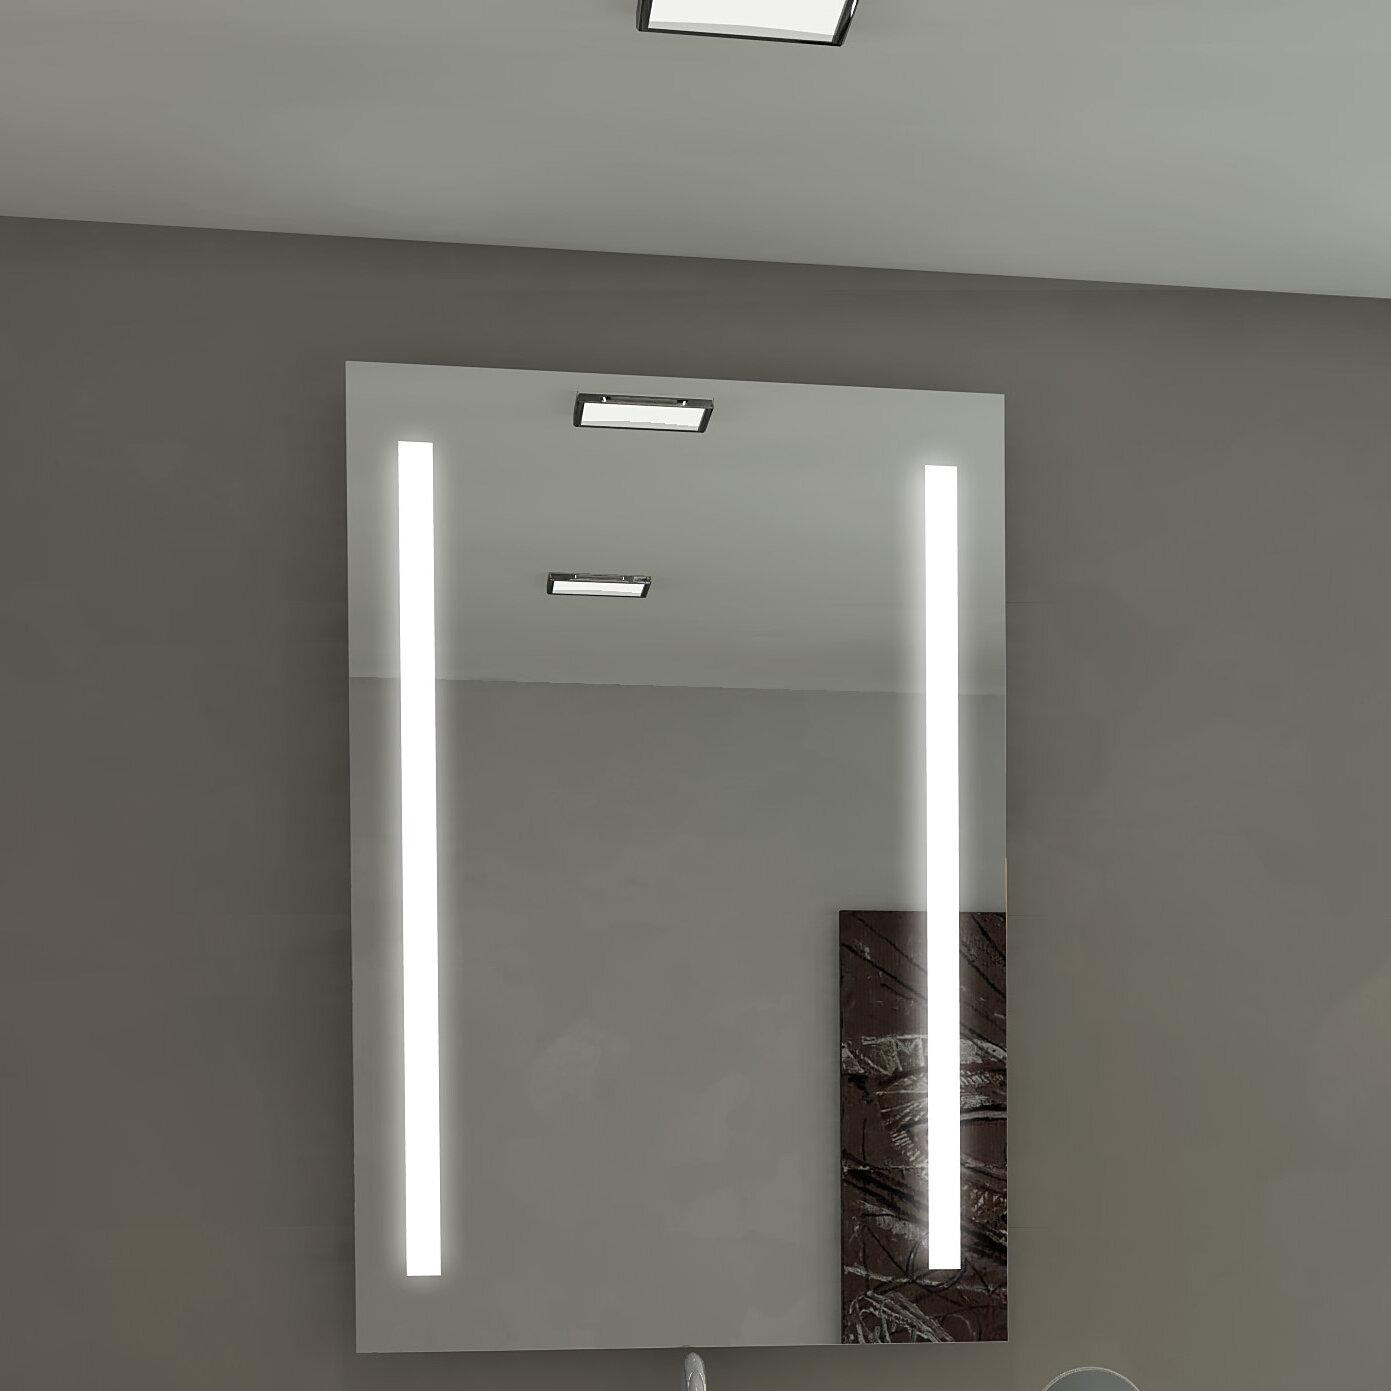 Orren Ellis Lency Illuminated Eco Friendly Bathroom Vanity Wall Mirror Wayfair